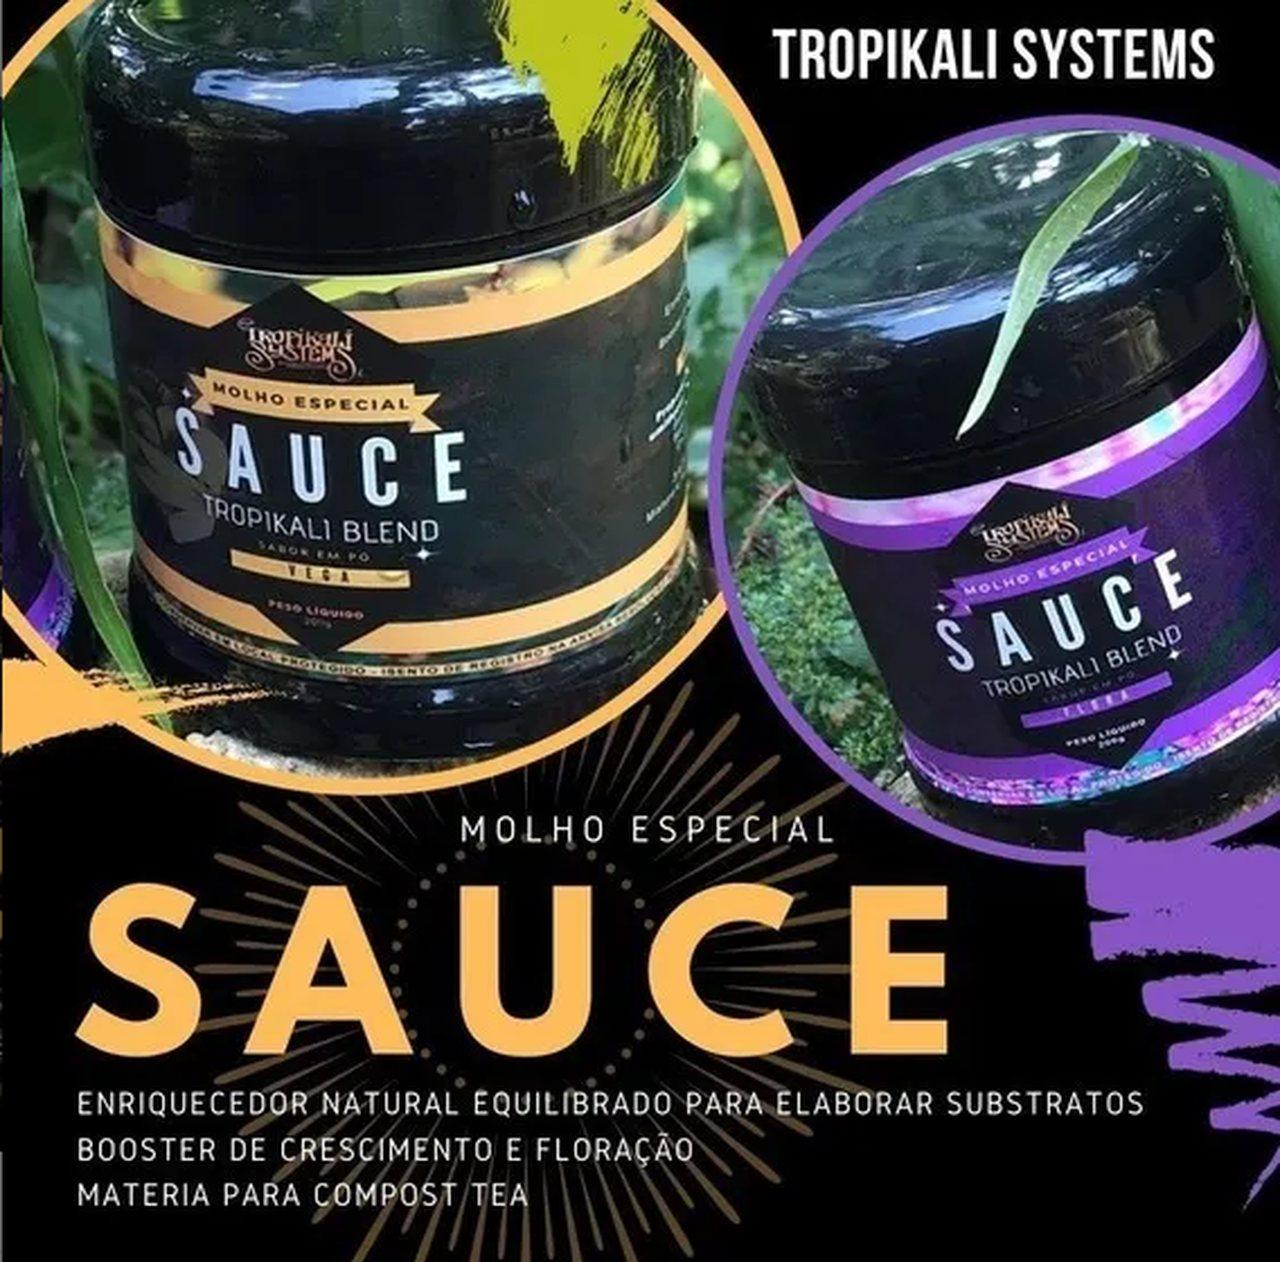 Tropikali Sauce VEGA 300g